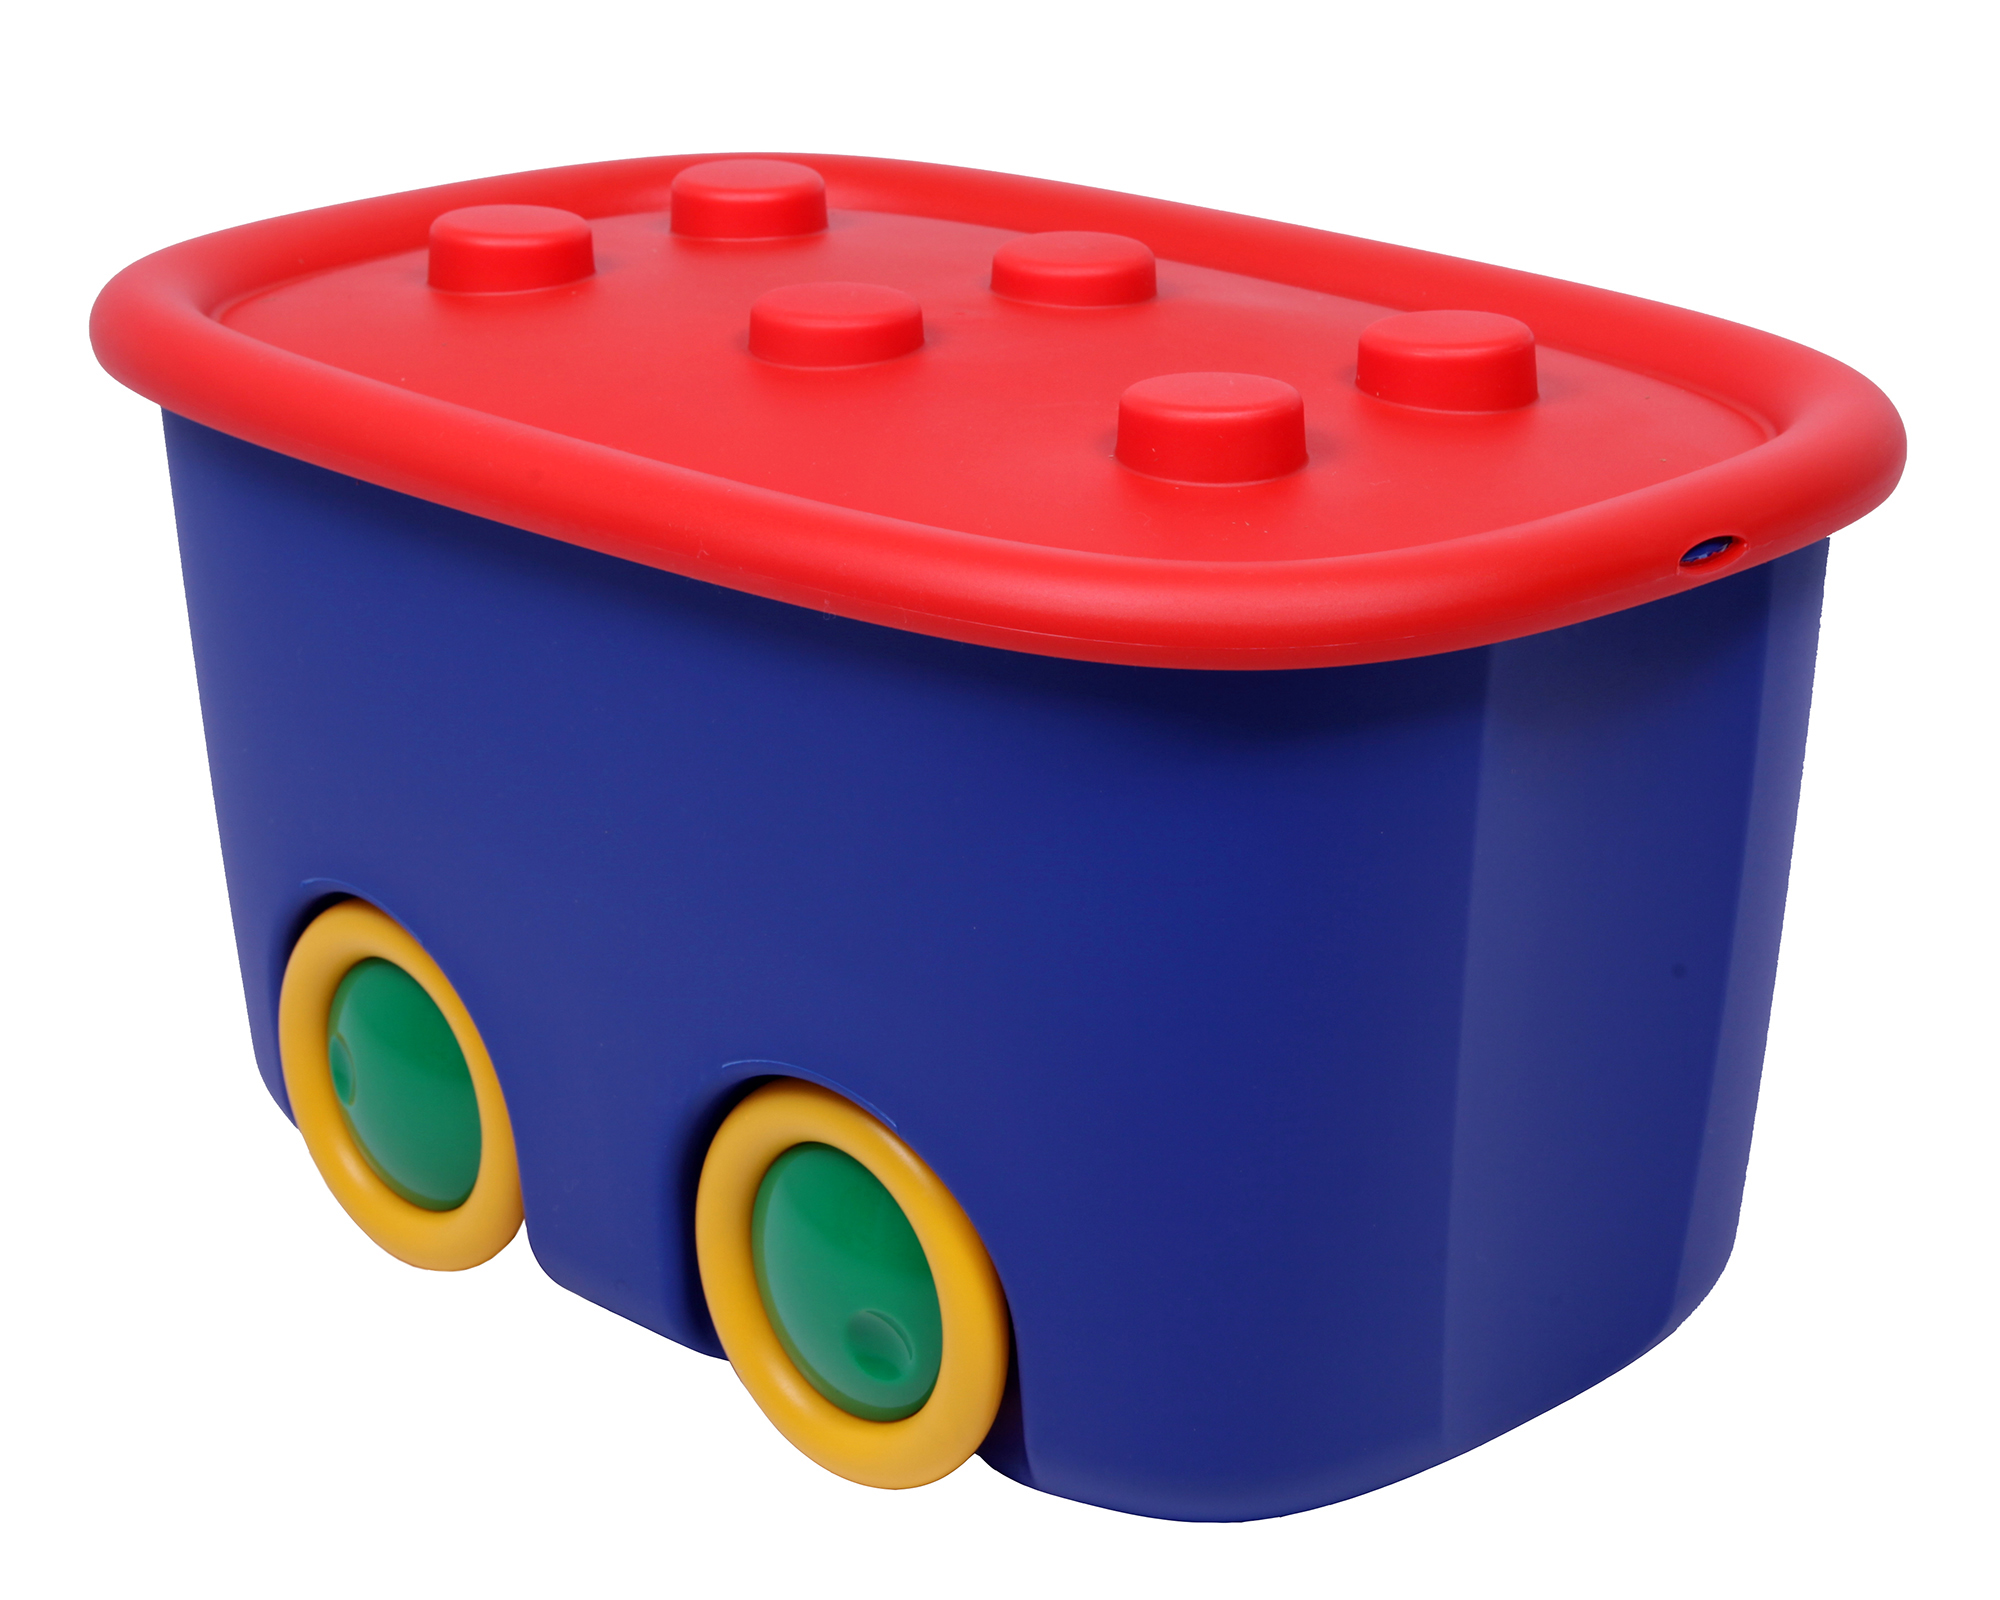 ondis24 spielzeugbox funny blau rot g nstig online kaufen. Black Bedroom Furniture Sets. Home Design Ideas